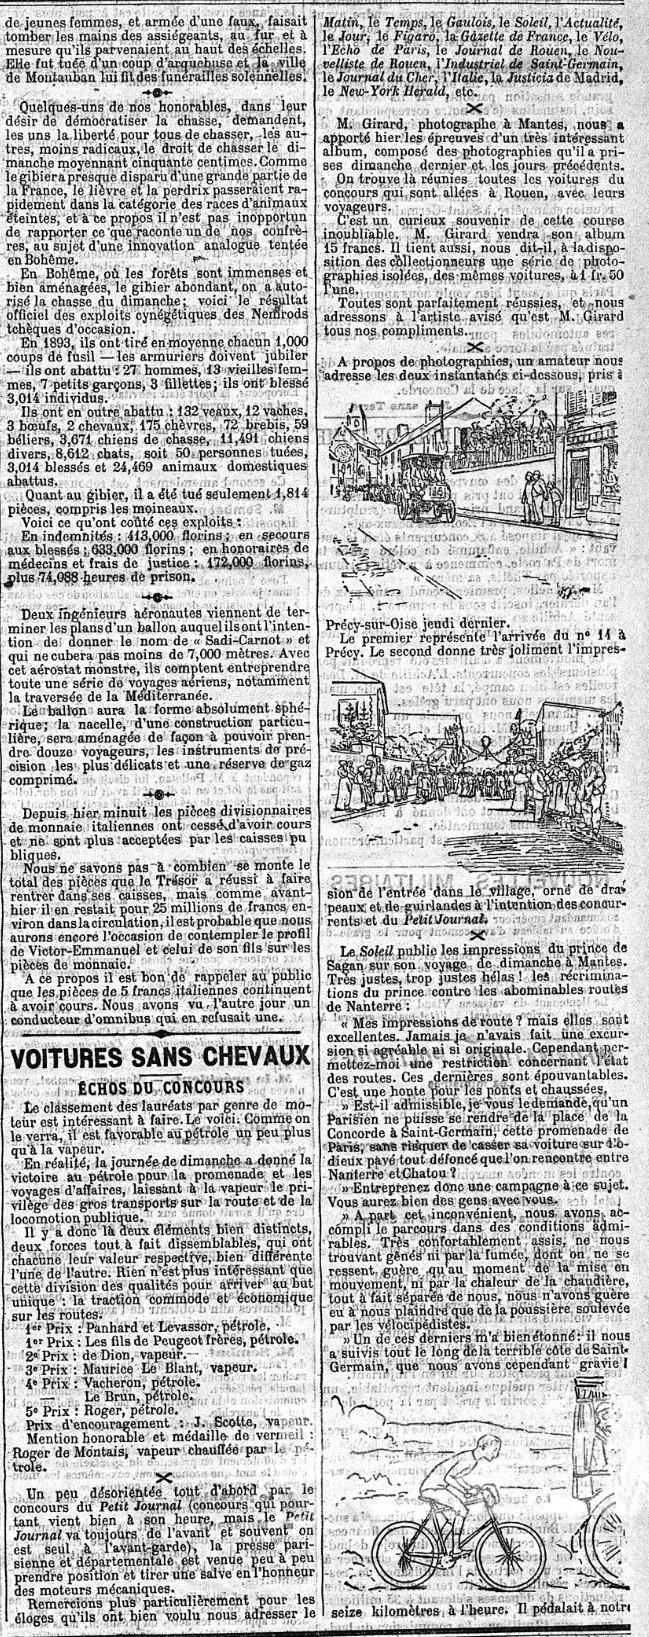 1894-07-25 1